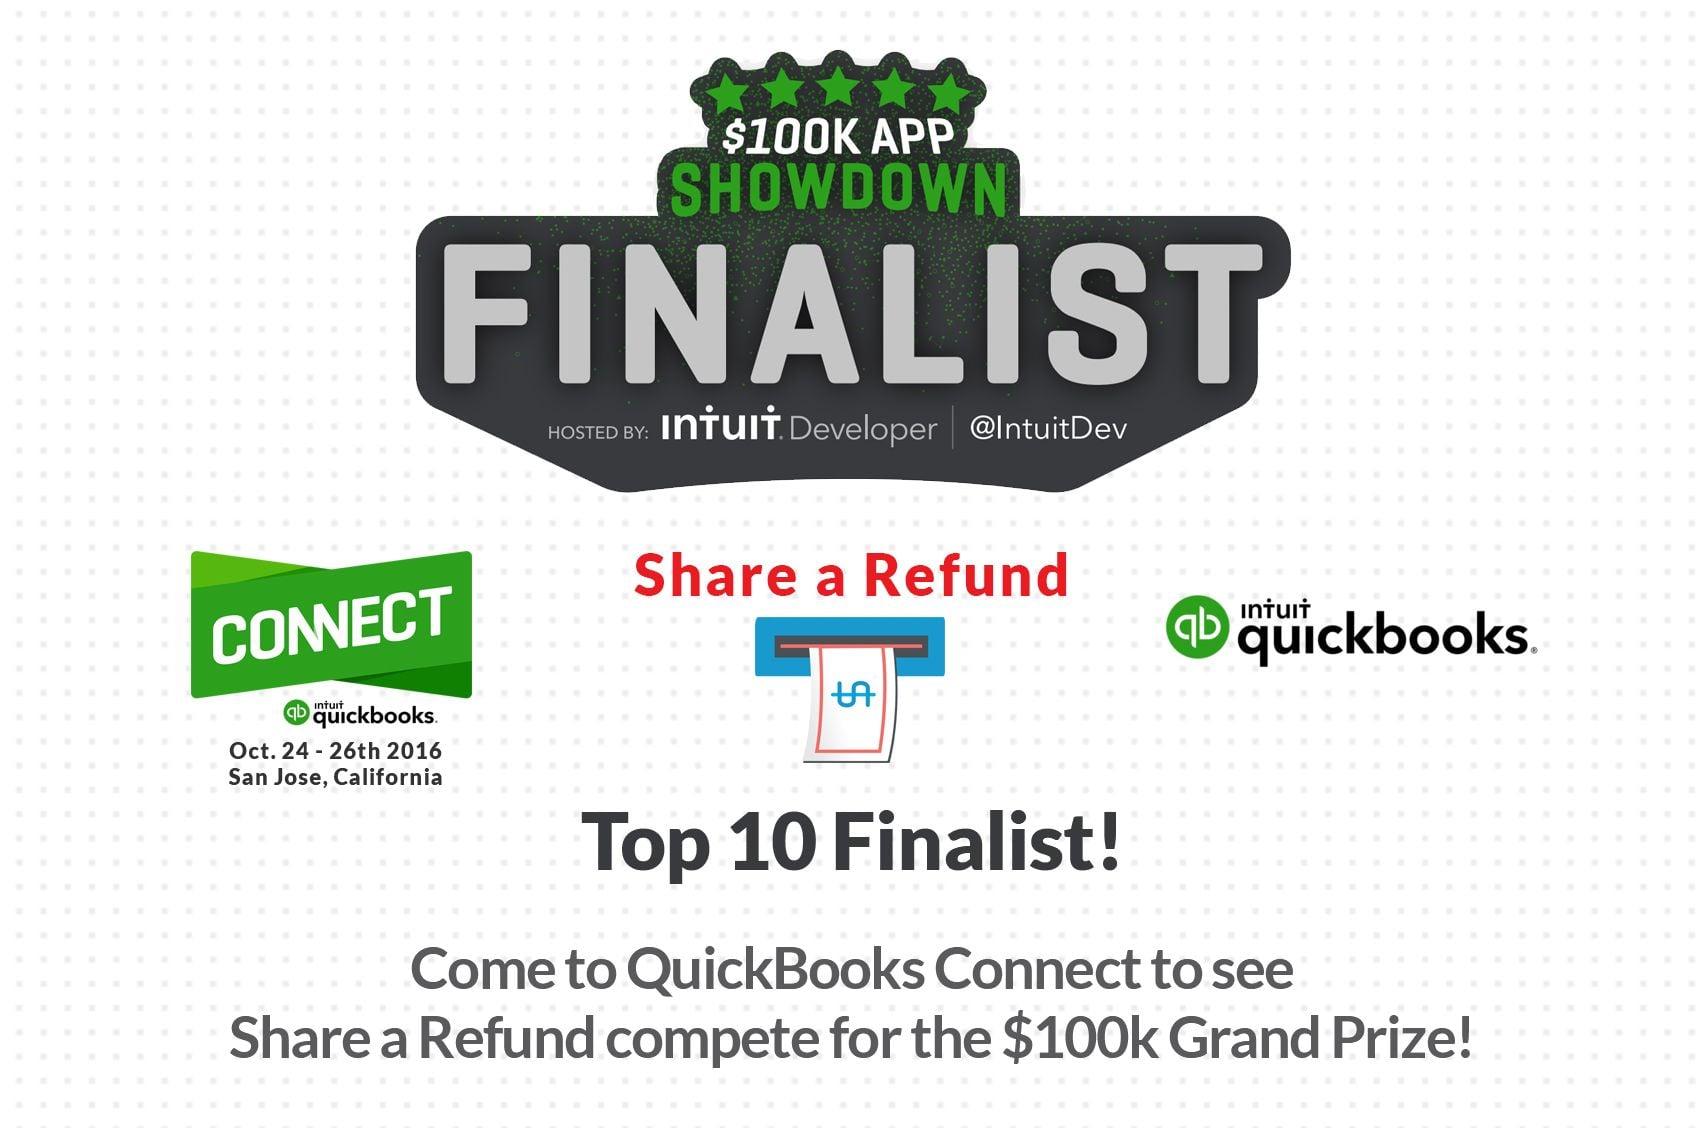 app showdown finalist for qbo connect